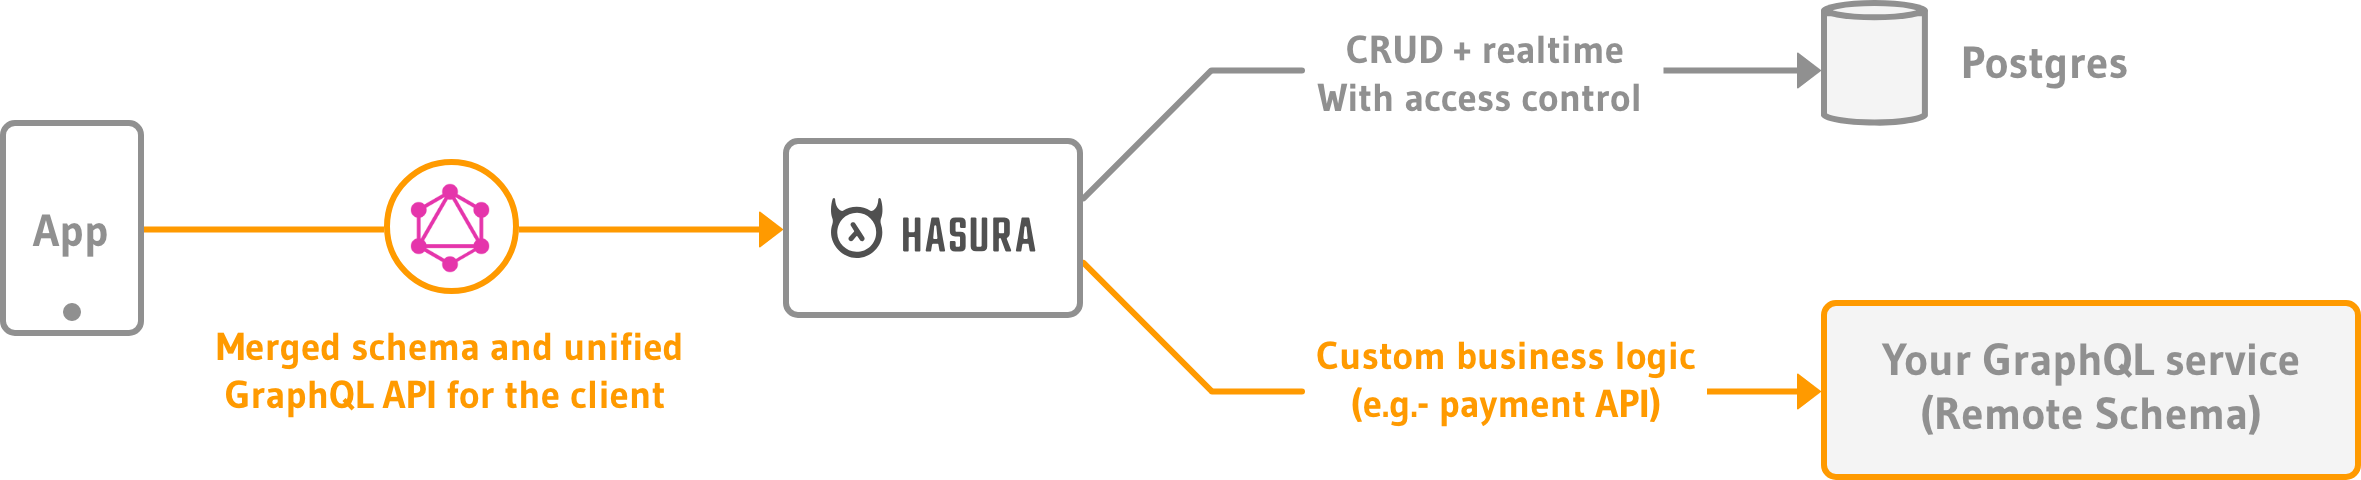 Create a Remote Schema to wrap a REST API with Hasura